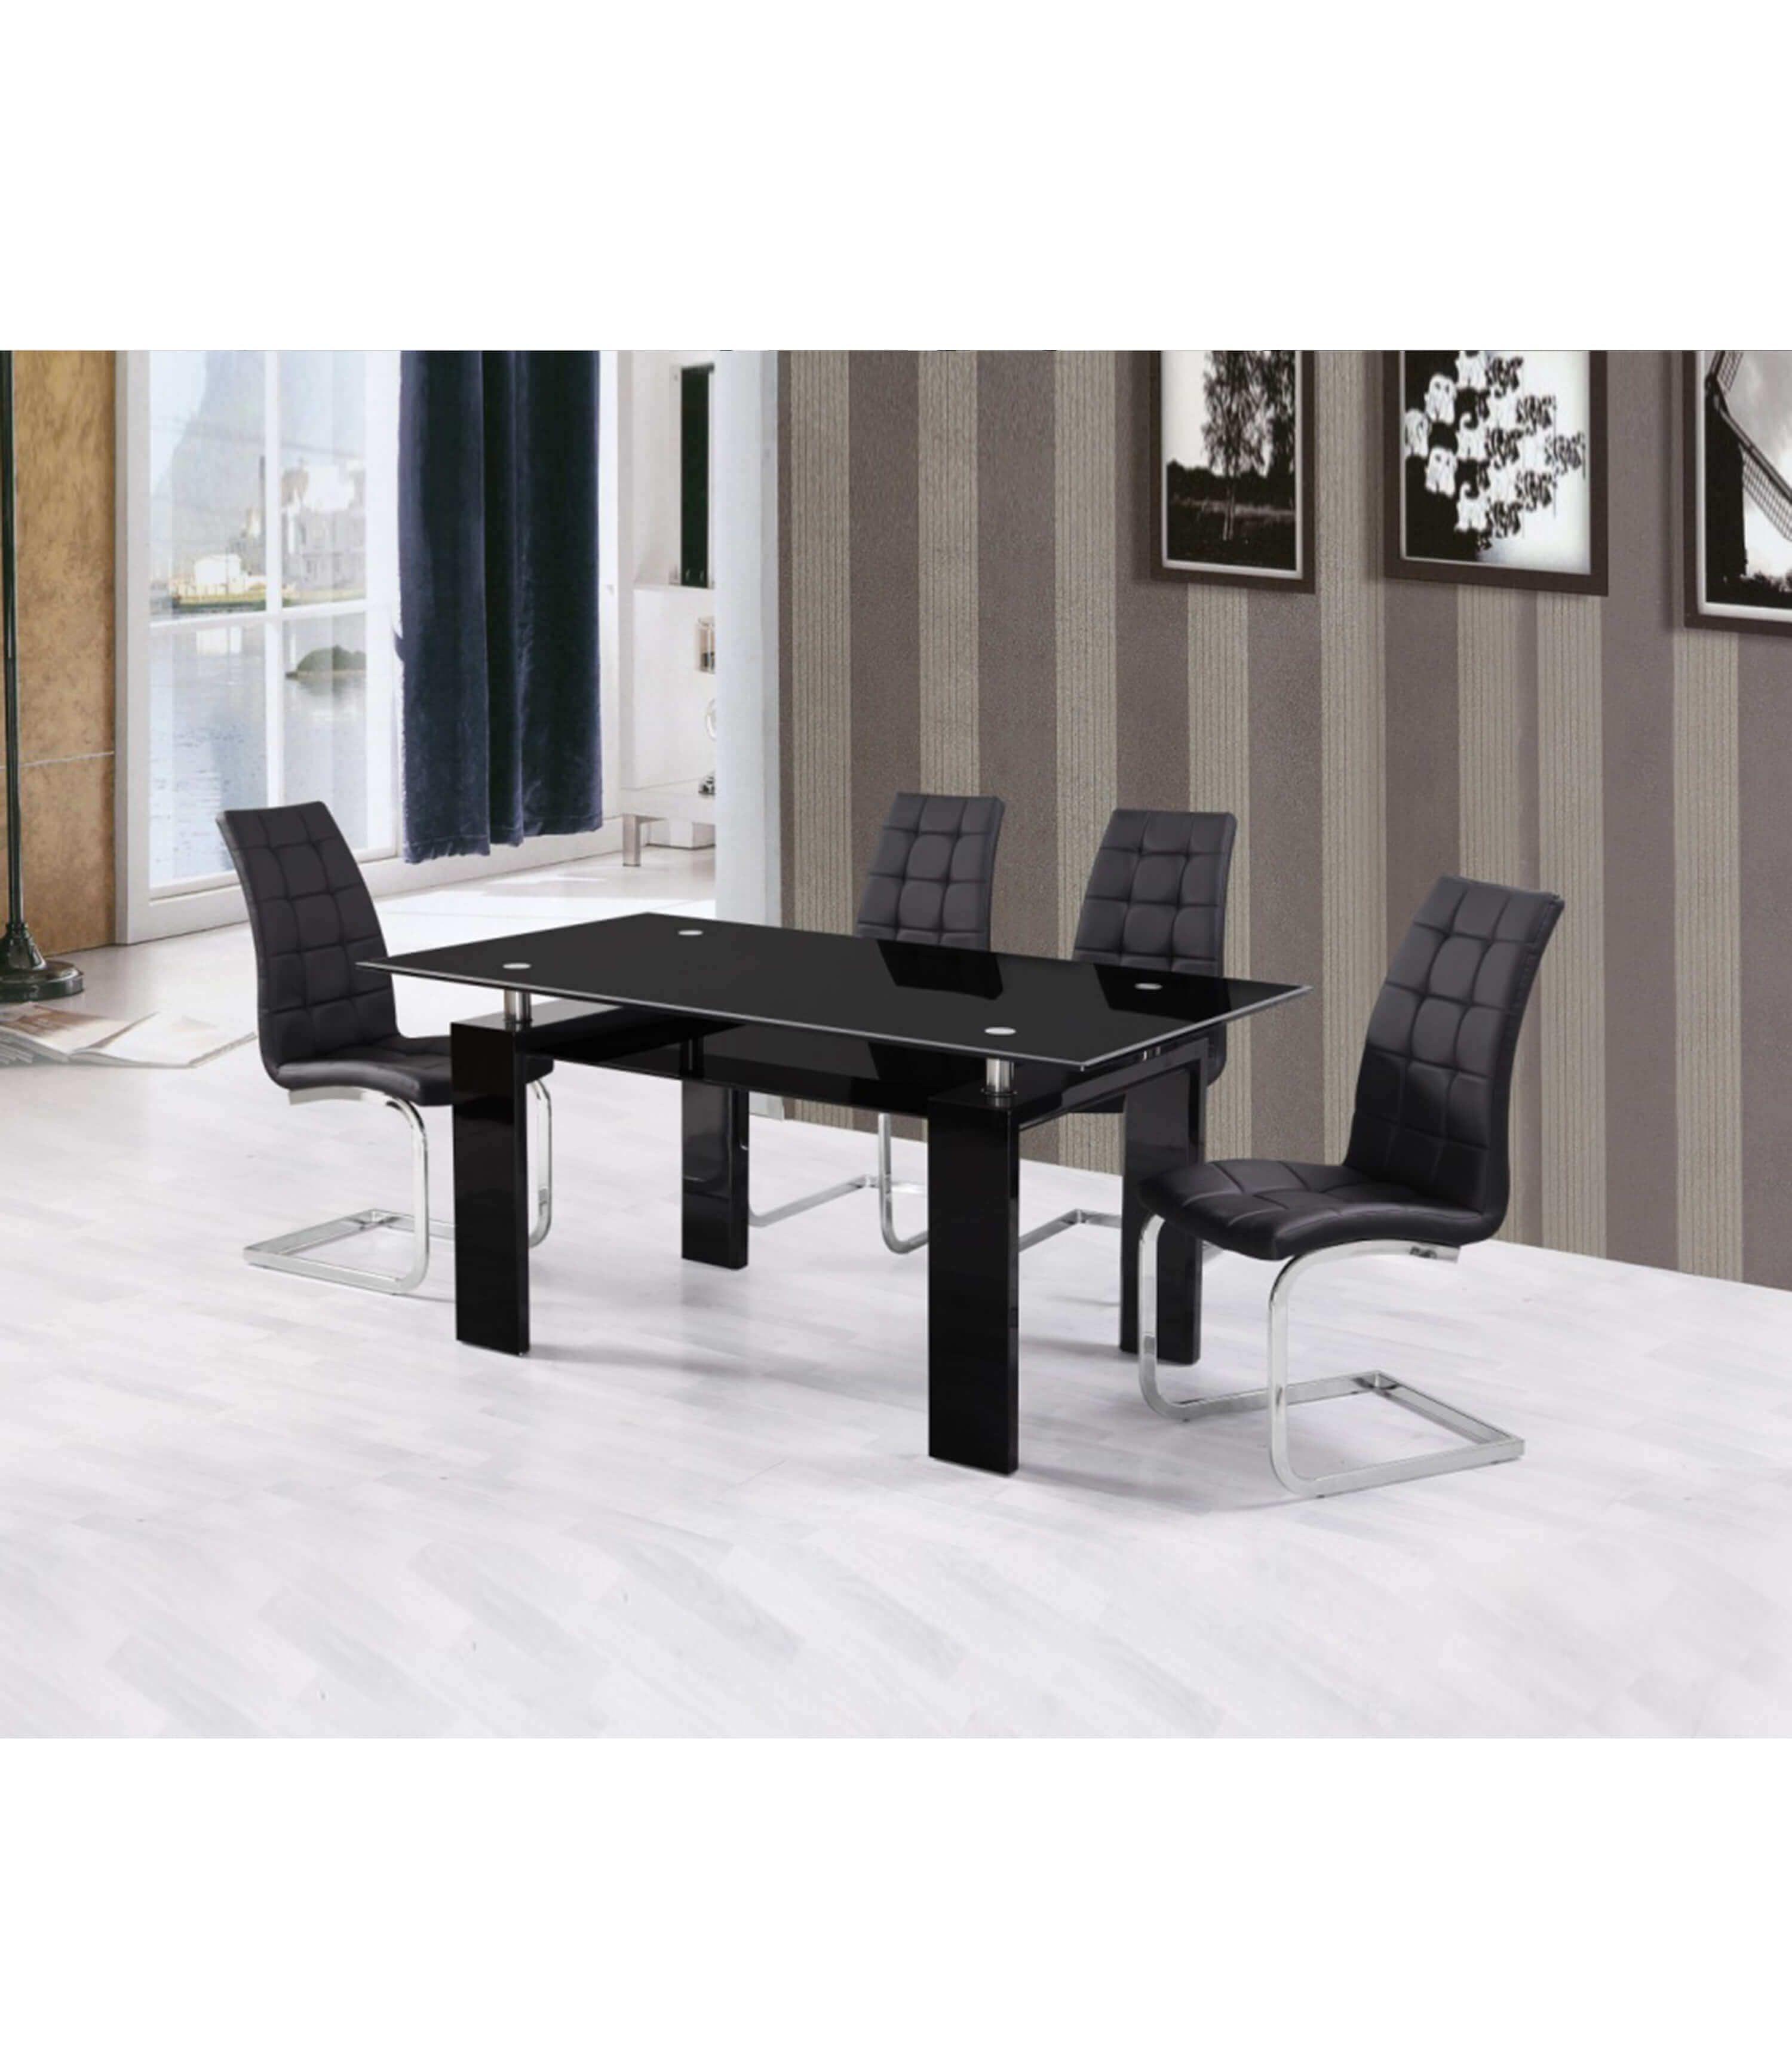 Black High Gloss Dining Table Living Room Modern Furniture